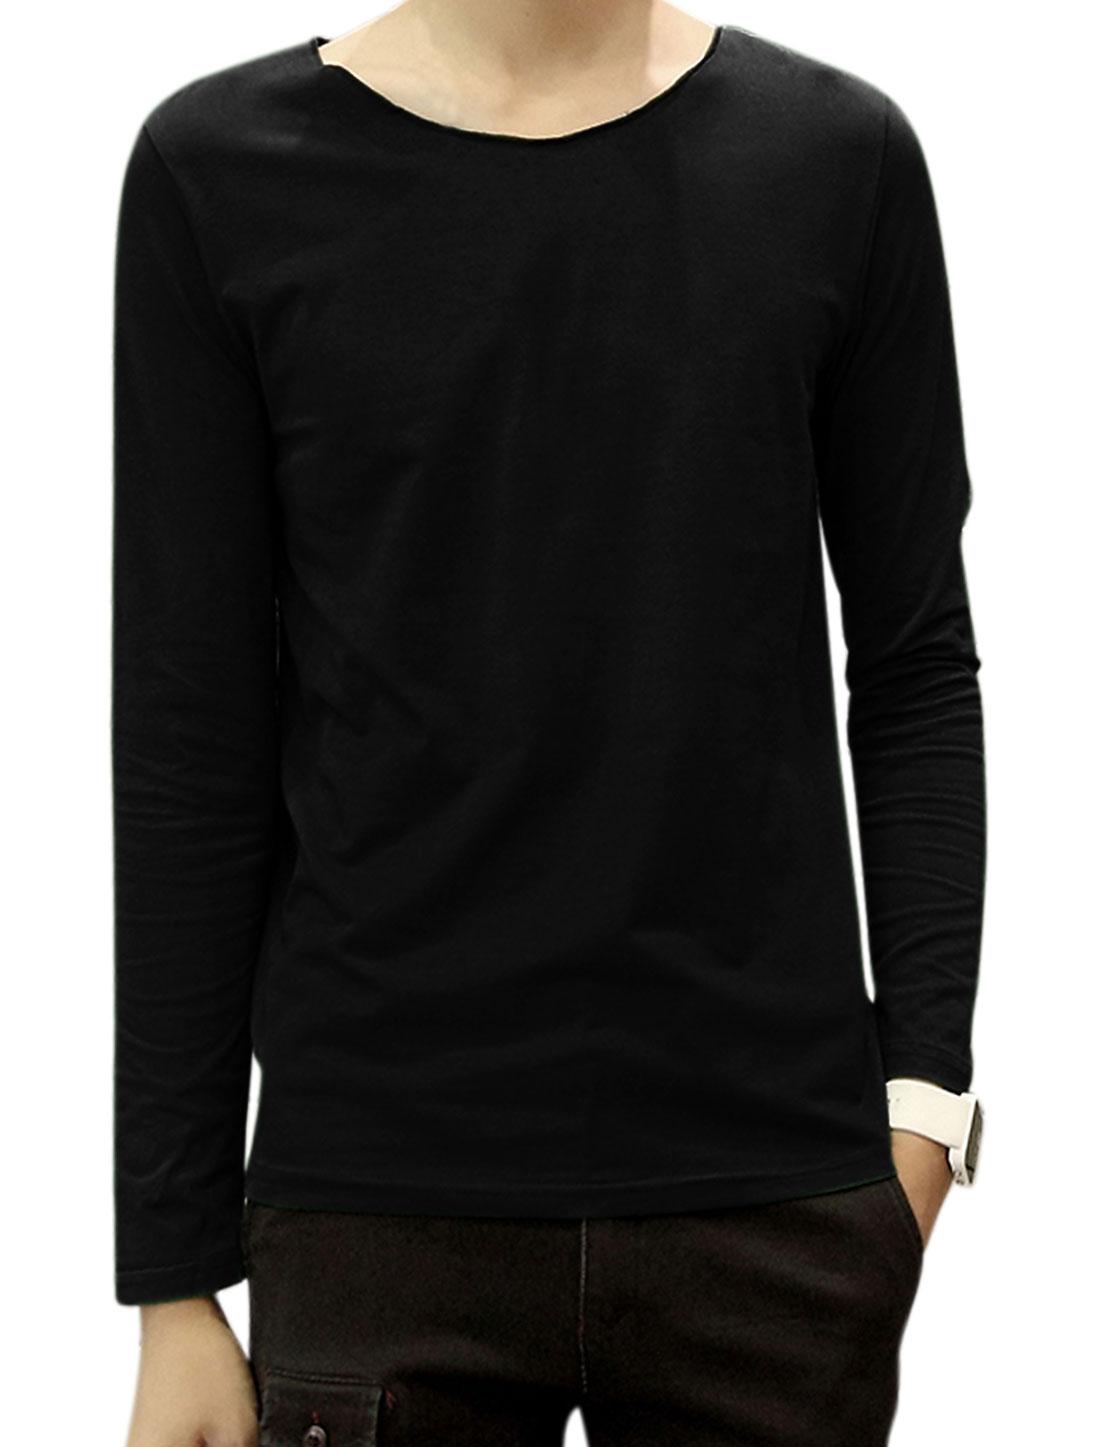 Man Long Sleeves Round Neck Raw Edge Tee Shirt Black M